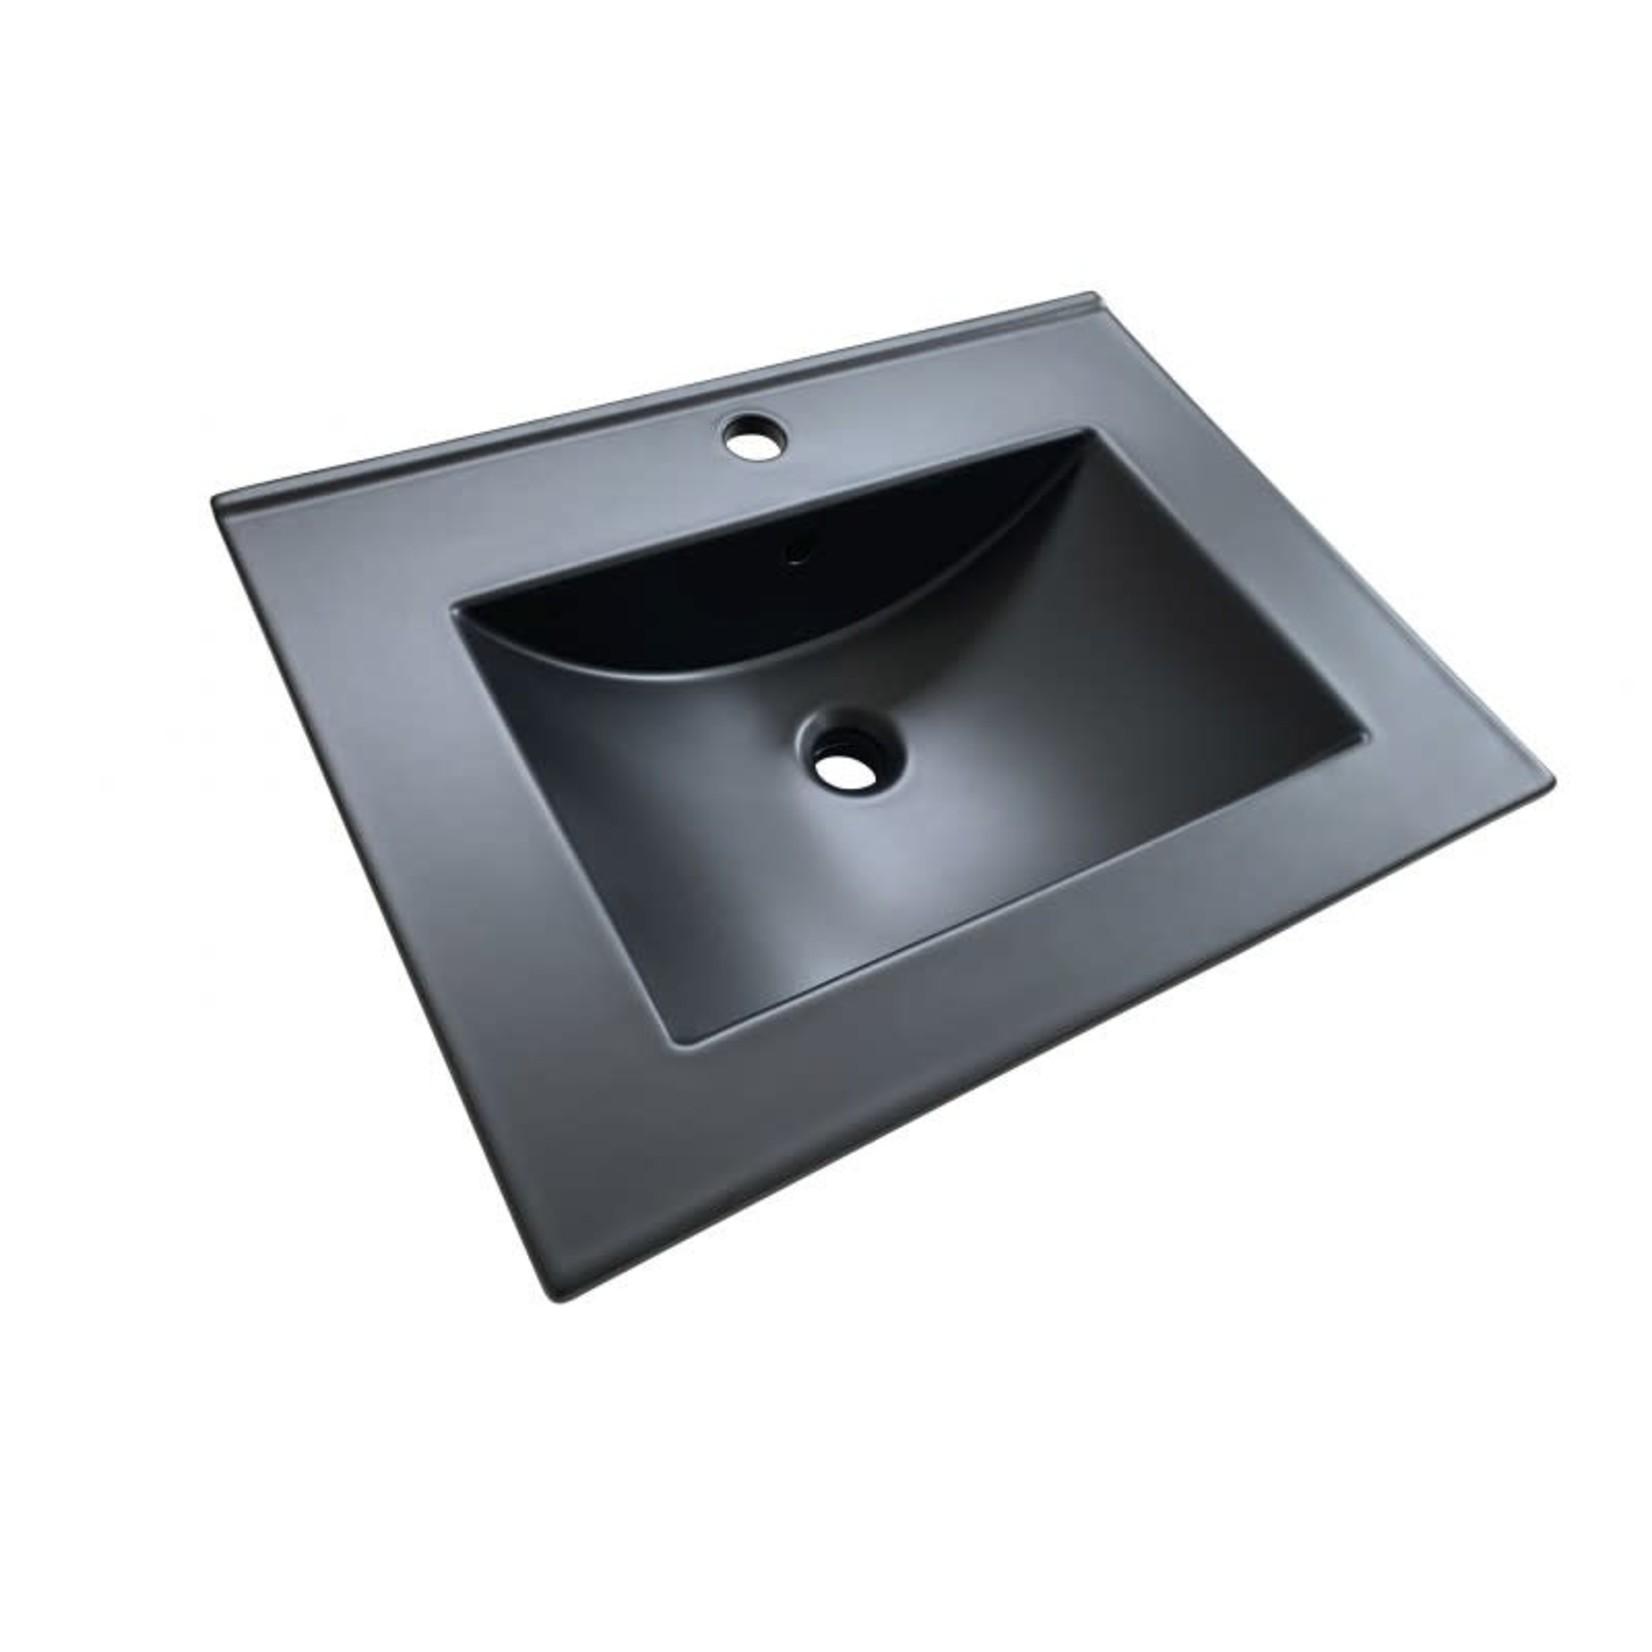 24 '' X 18 '' Porcelain sink Black DI-20260-B